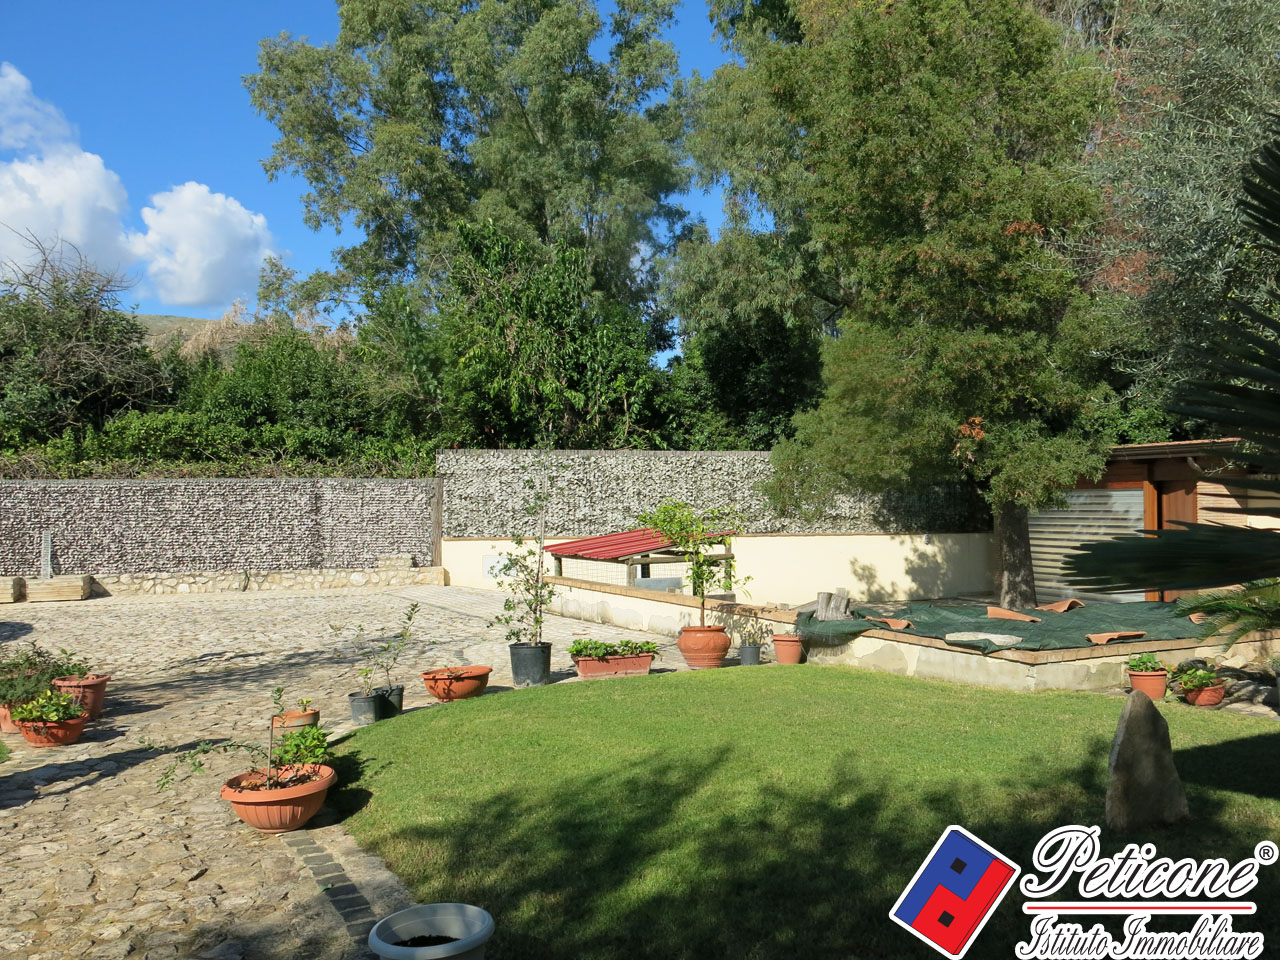 Villa in Vendita a Fondi: 3 locali, 107 mq - Foto 30